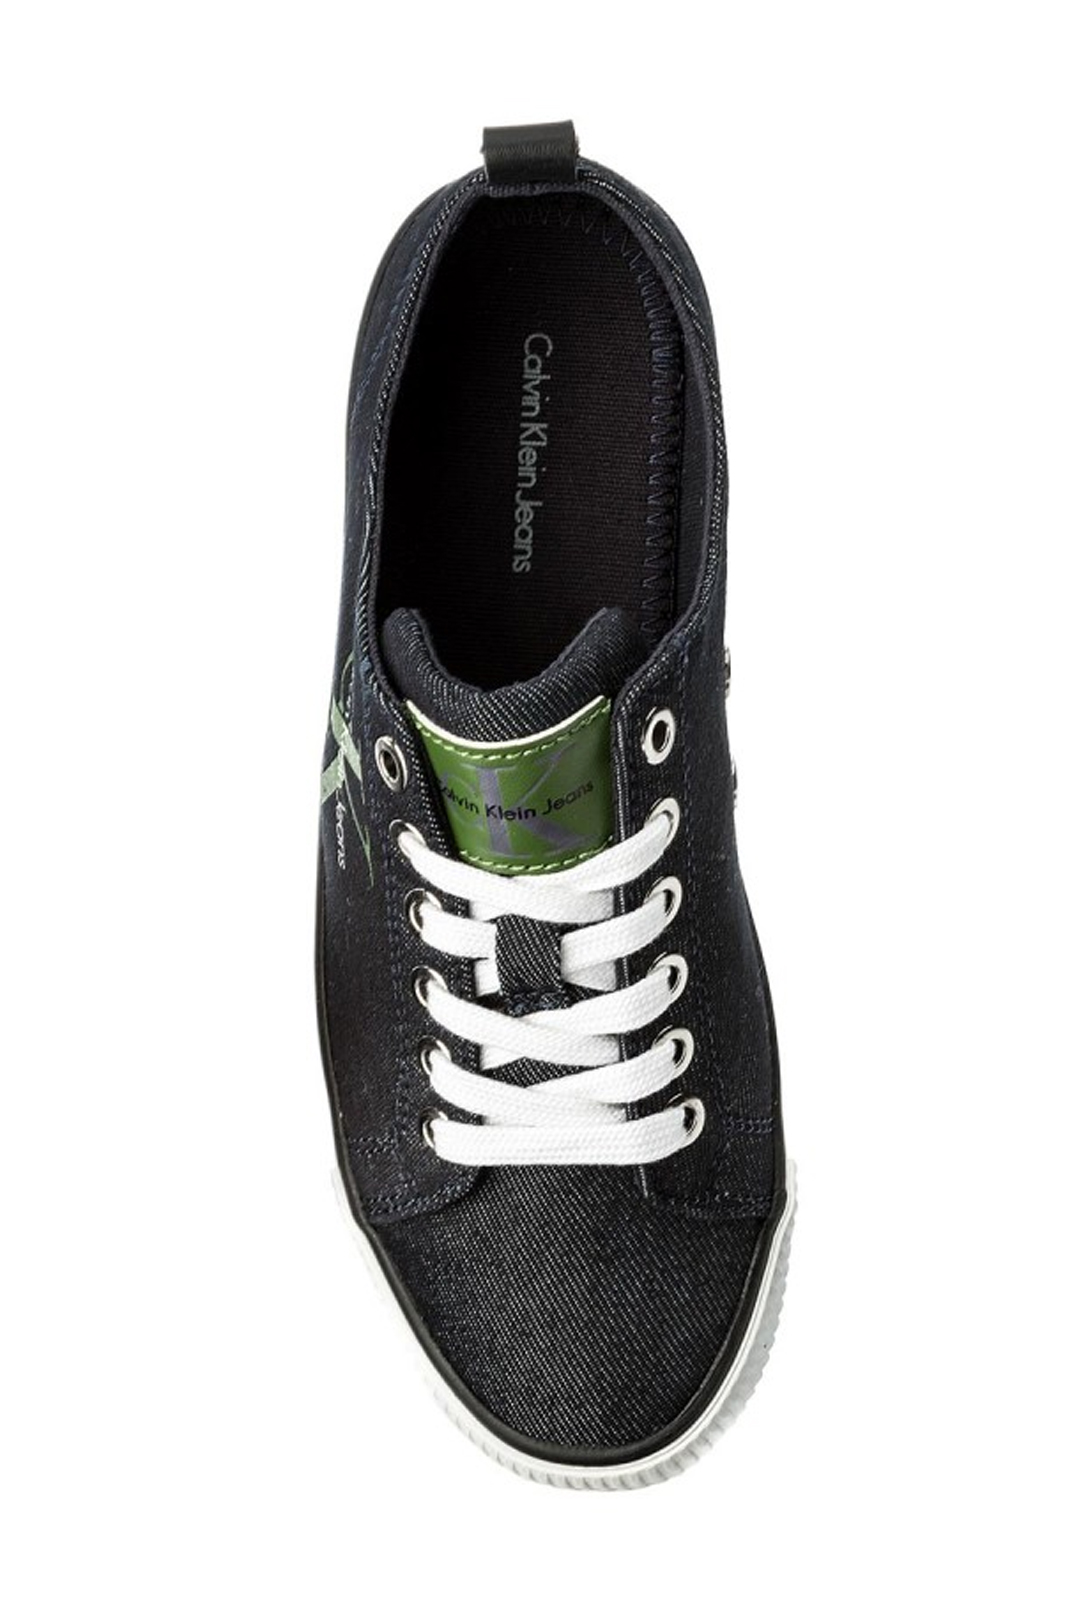 Baskets / Sneakers  Calvin klein DORA DENIM INDIGO